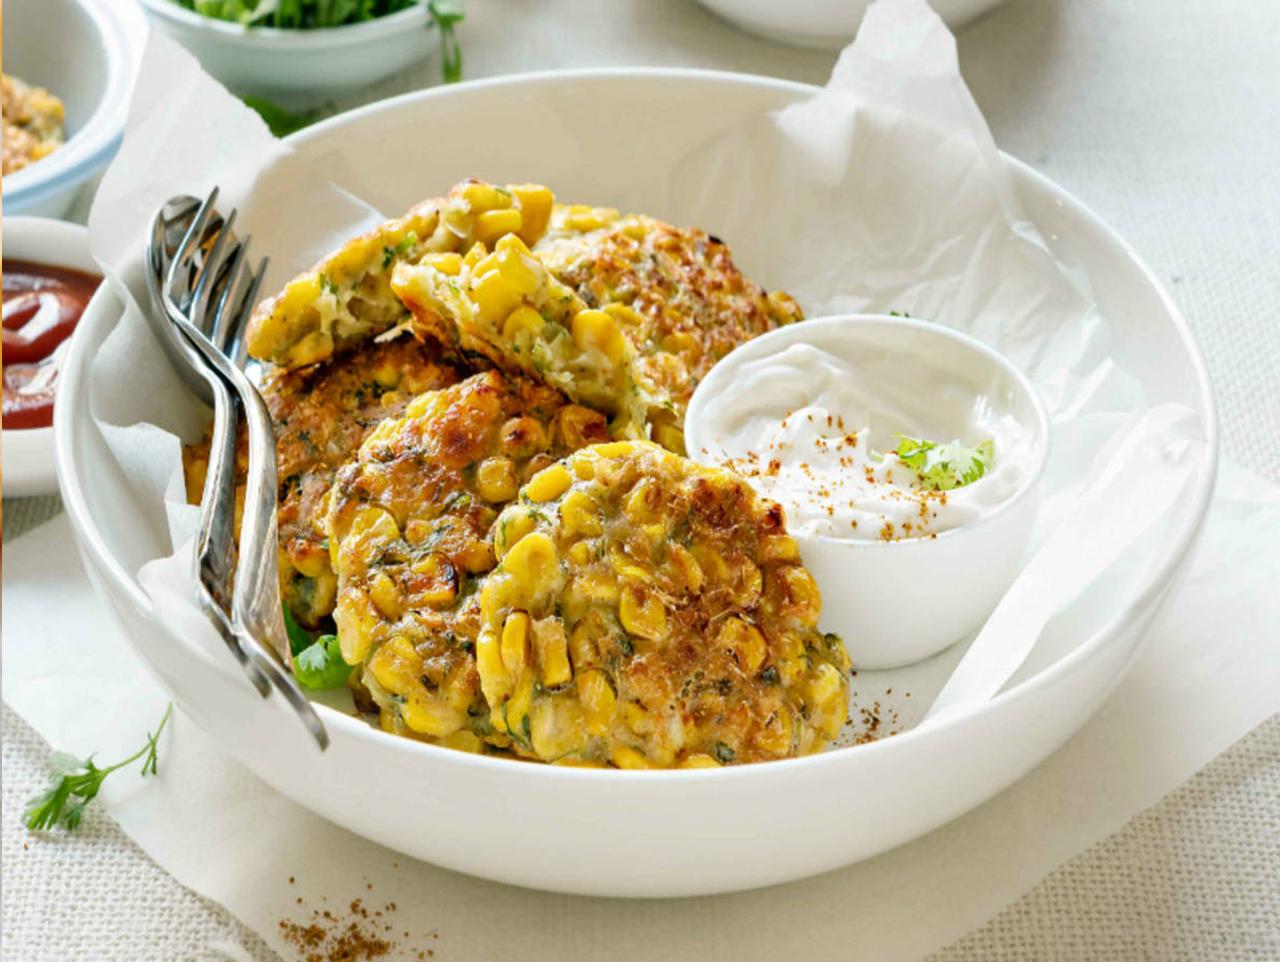 Parmesan Basil Corn Cakes